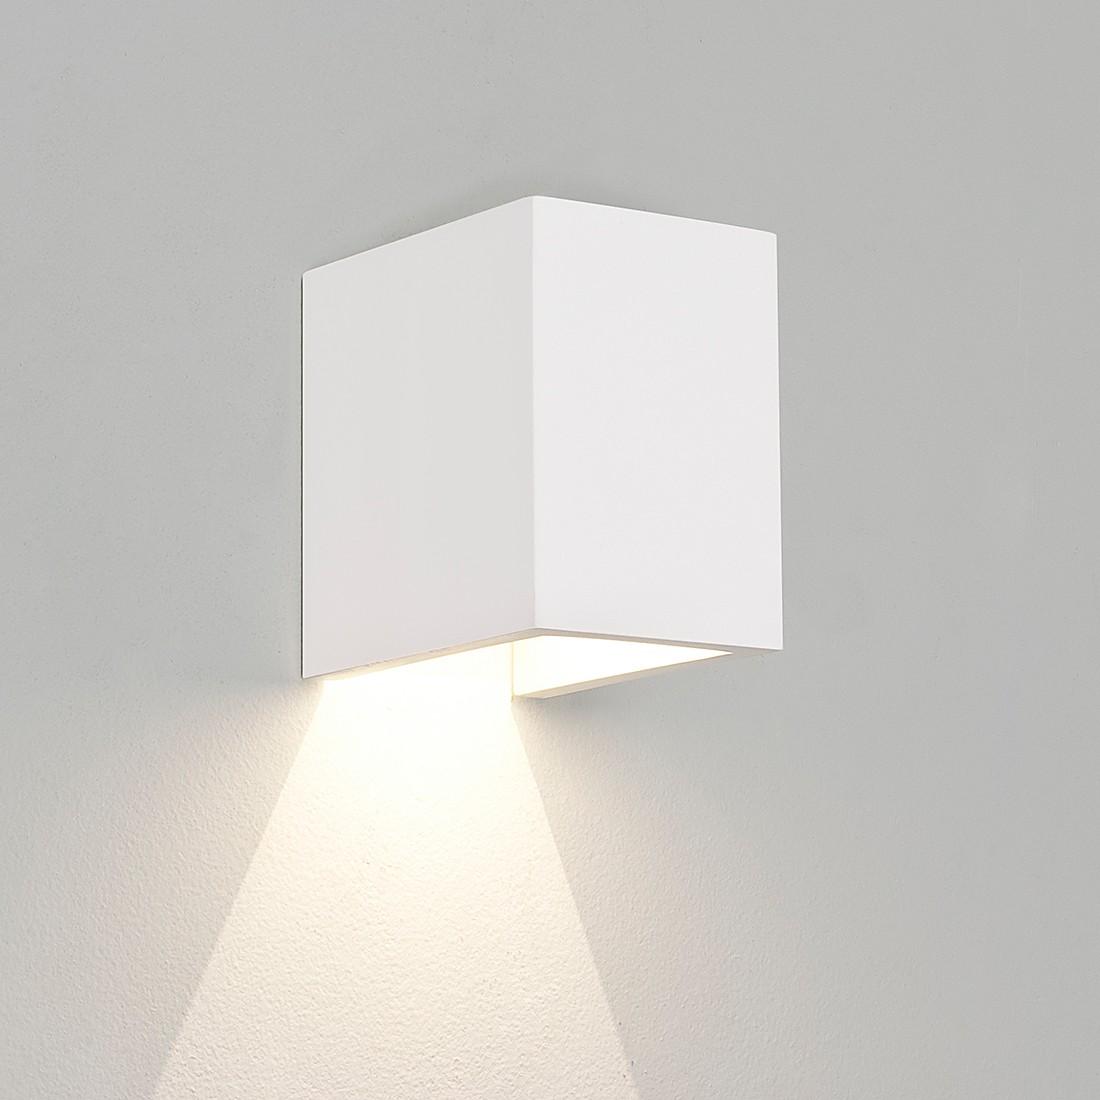 Wandleuchte Parma 100 ● Chrom ● 1-flammig- Illumina A+